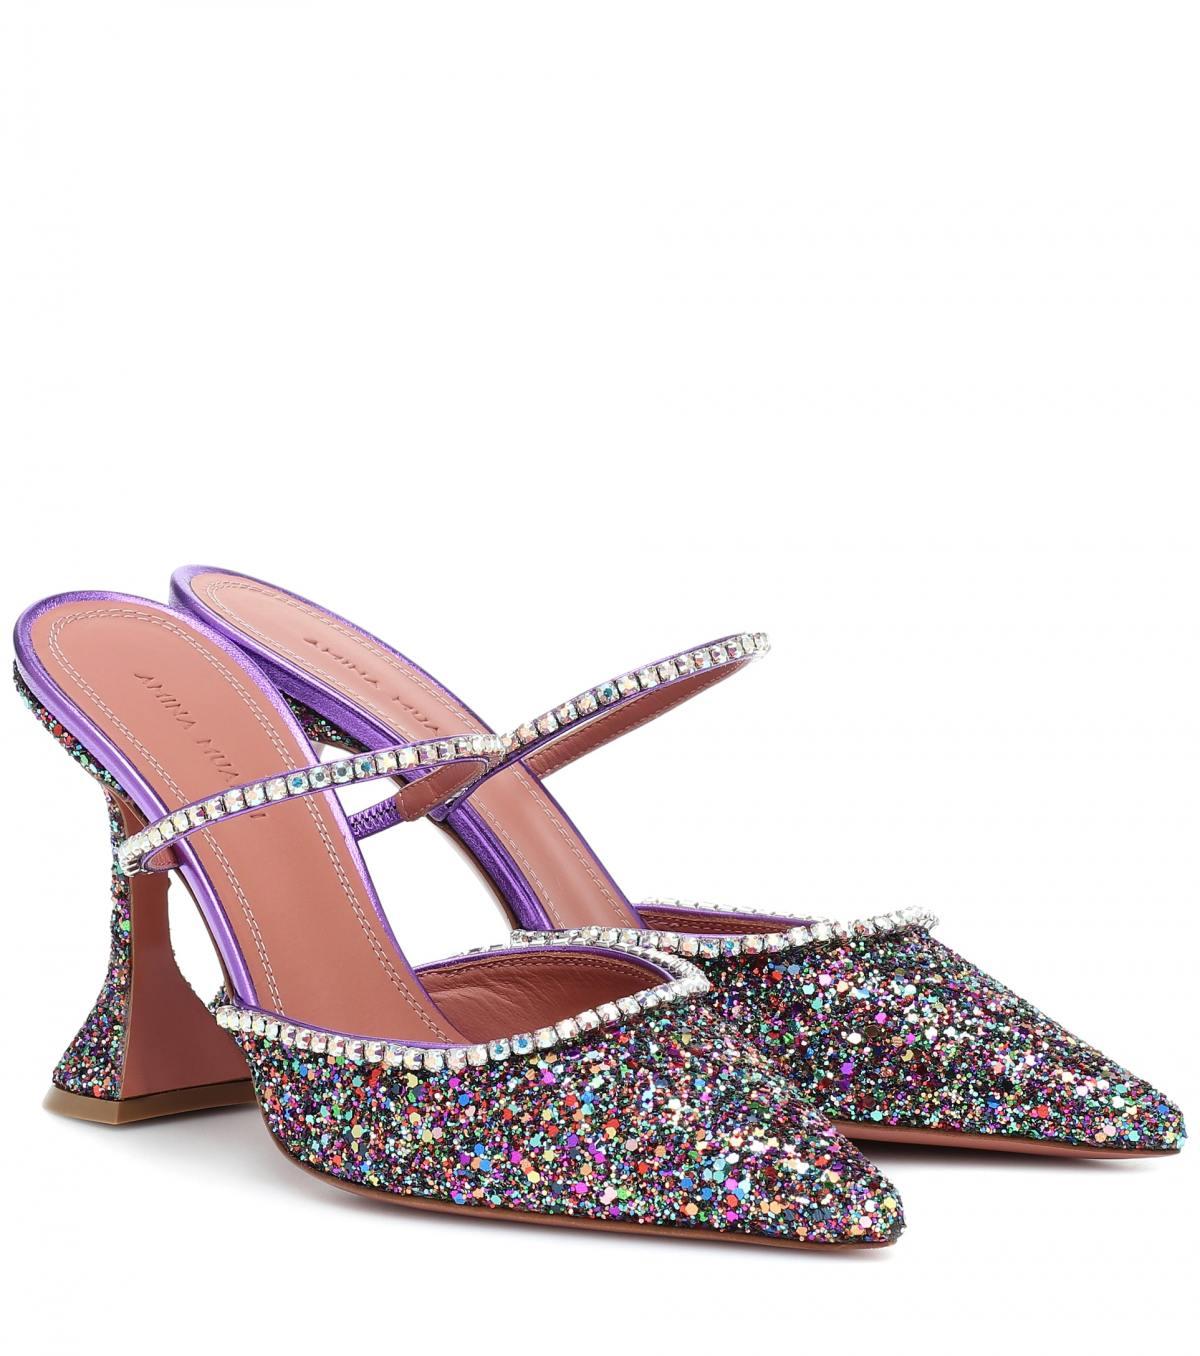 Crystal Embellished Mules by Amina Muaddi, available on mytheresa.com for $945 Kendall Jenner Shoes Exact Product